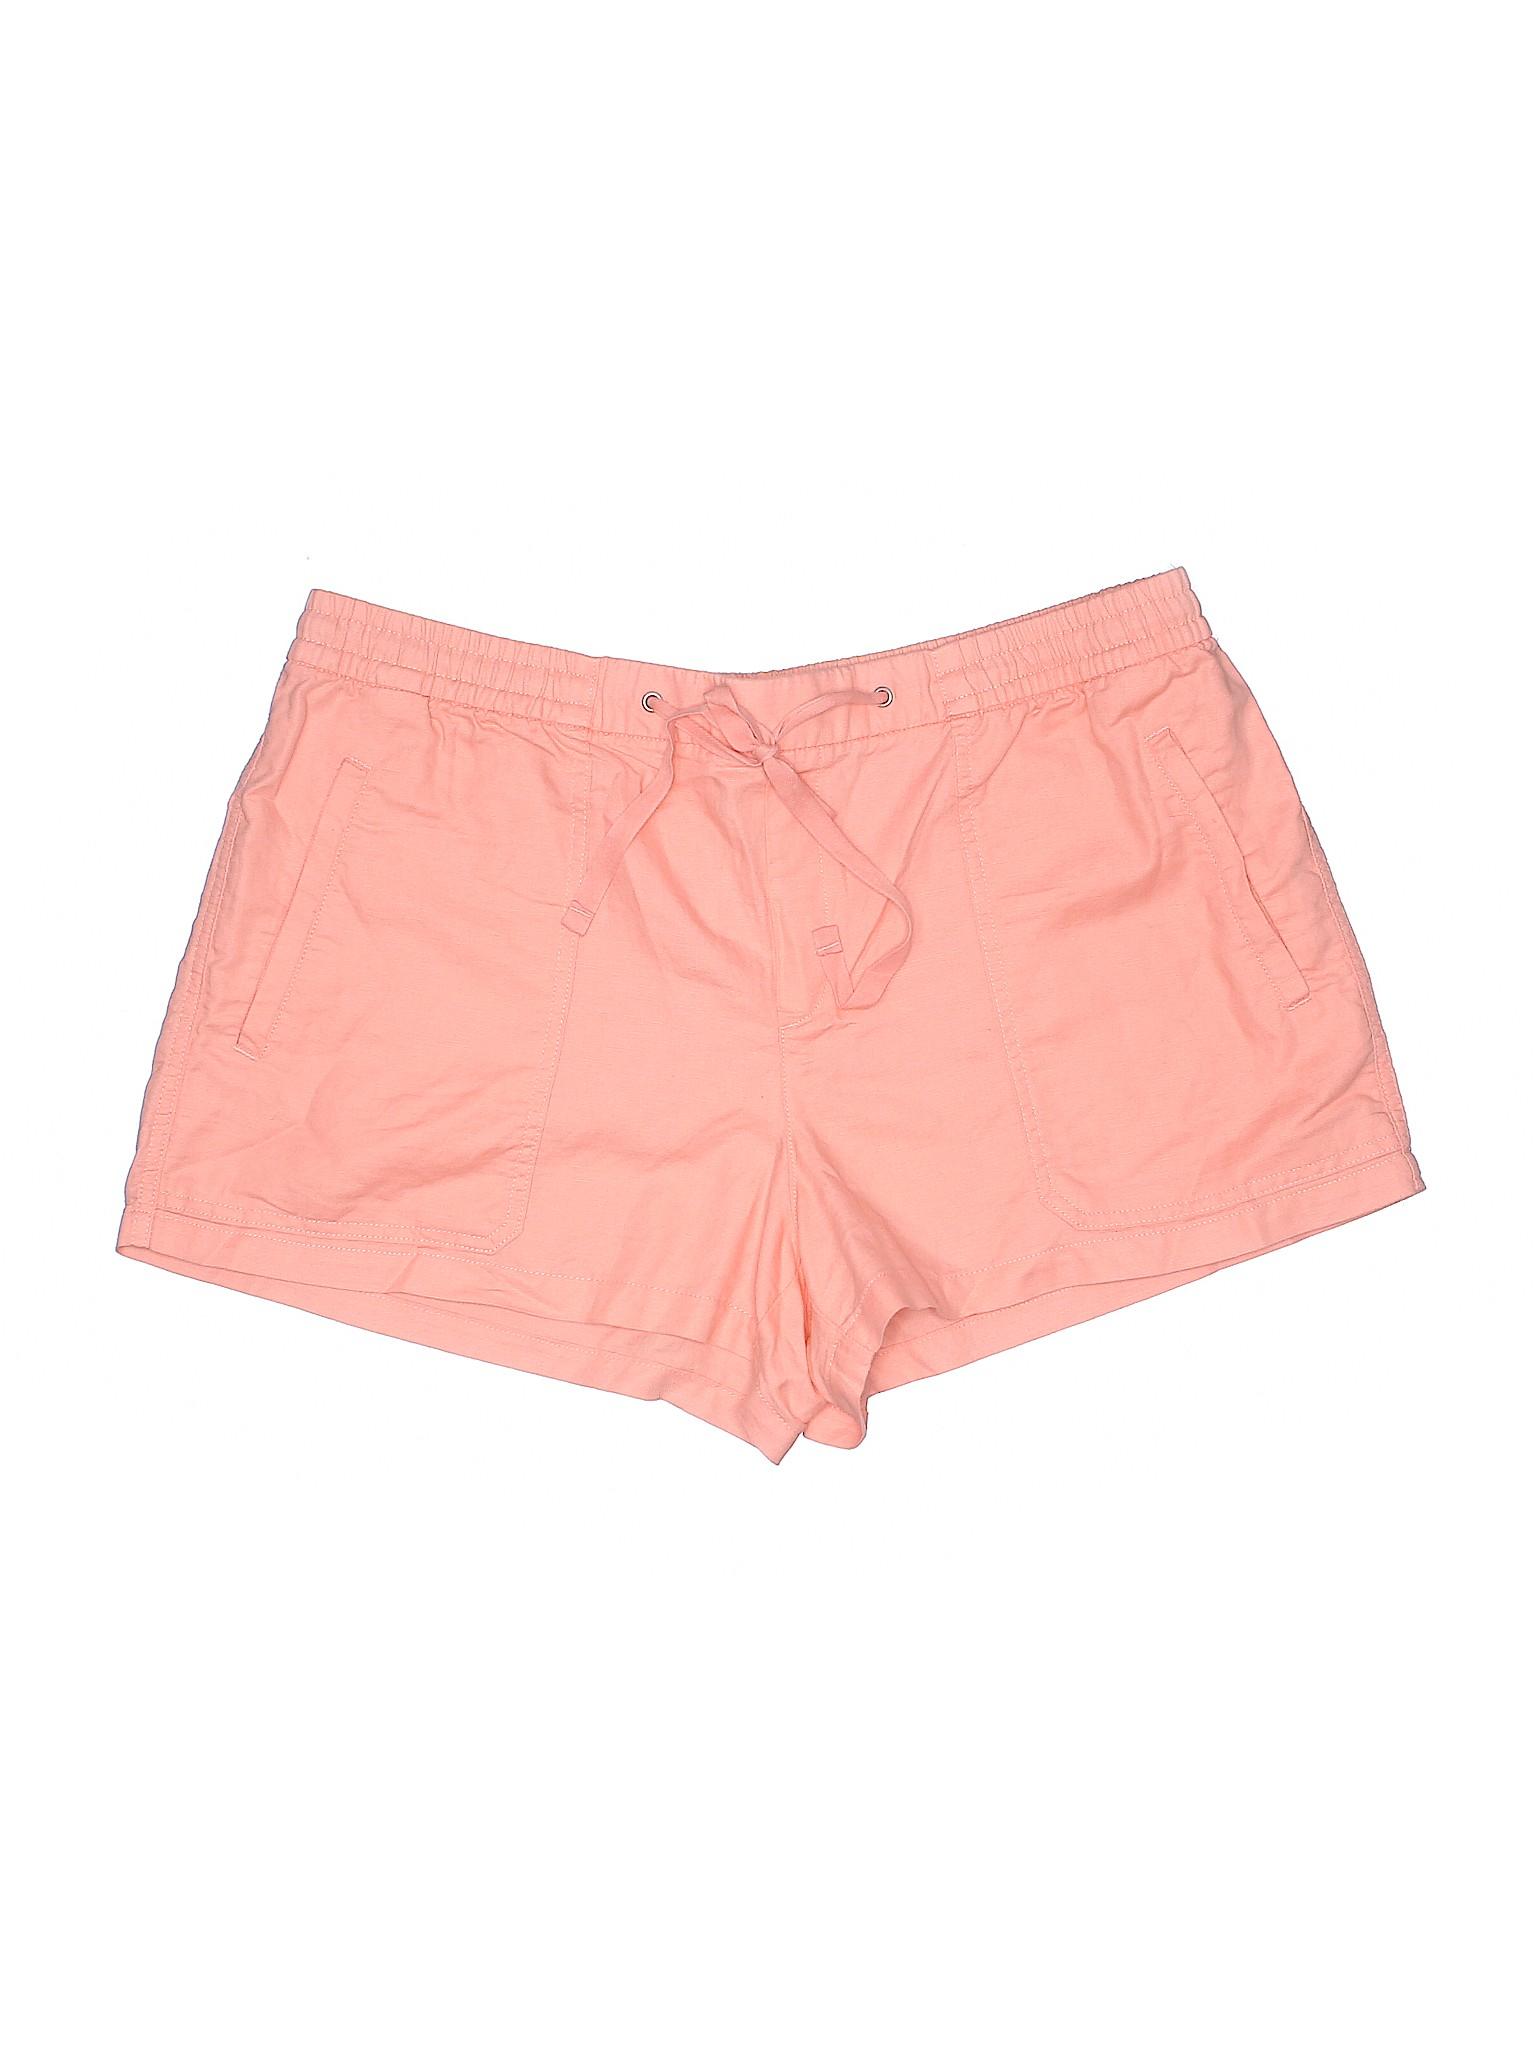 Boutique Boutique Boutique Shorts leisure Shorts Boutique leisure Gap Gap Shorts Gap leisure qEOng